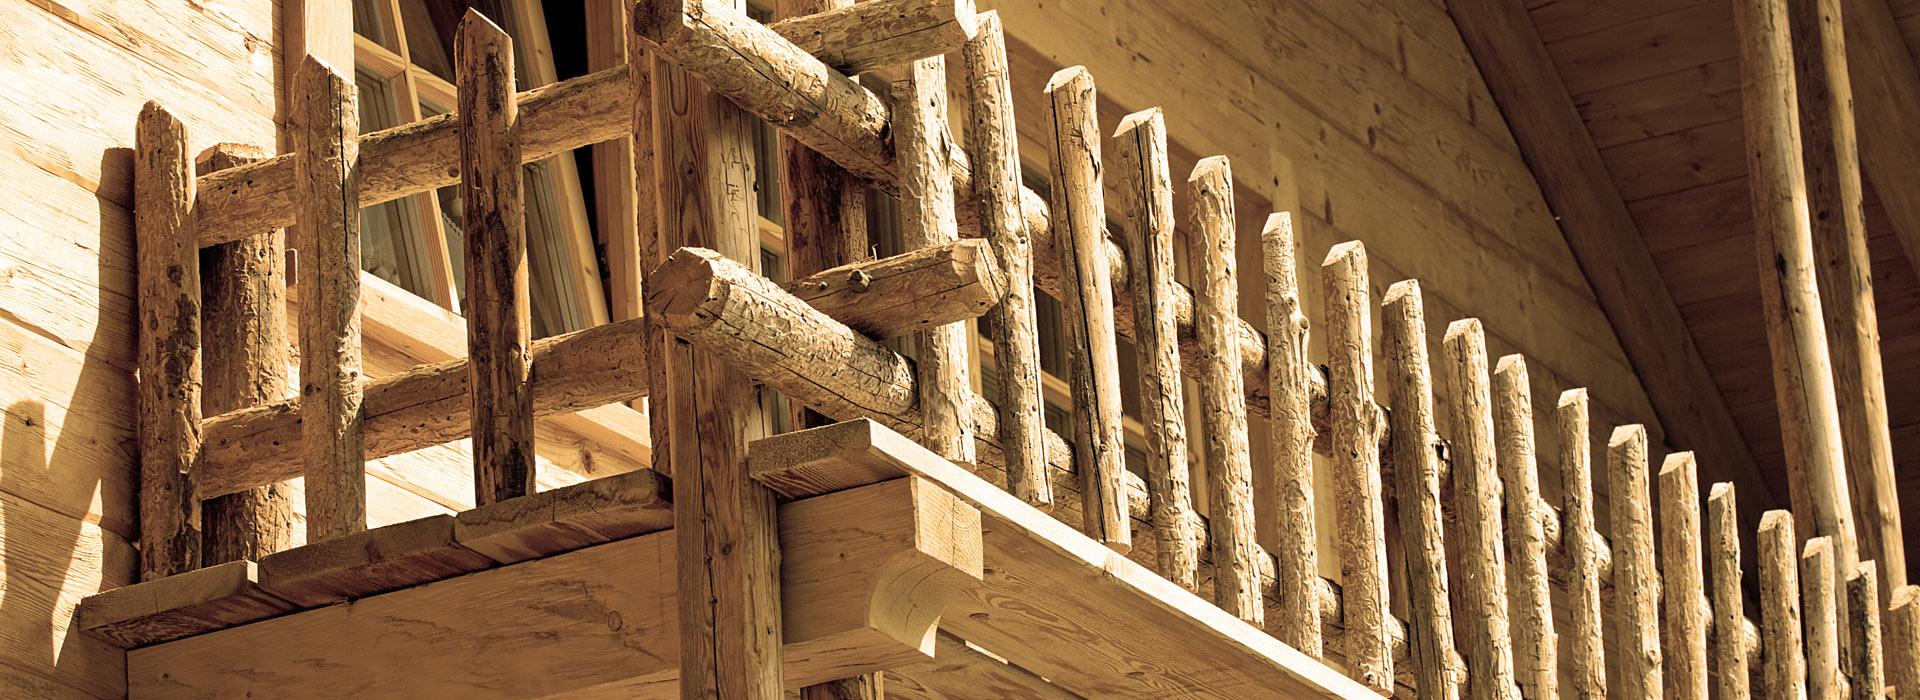 madera-chalets